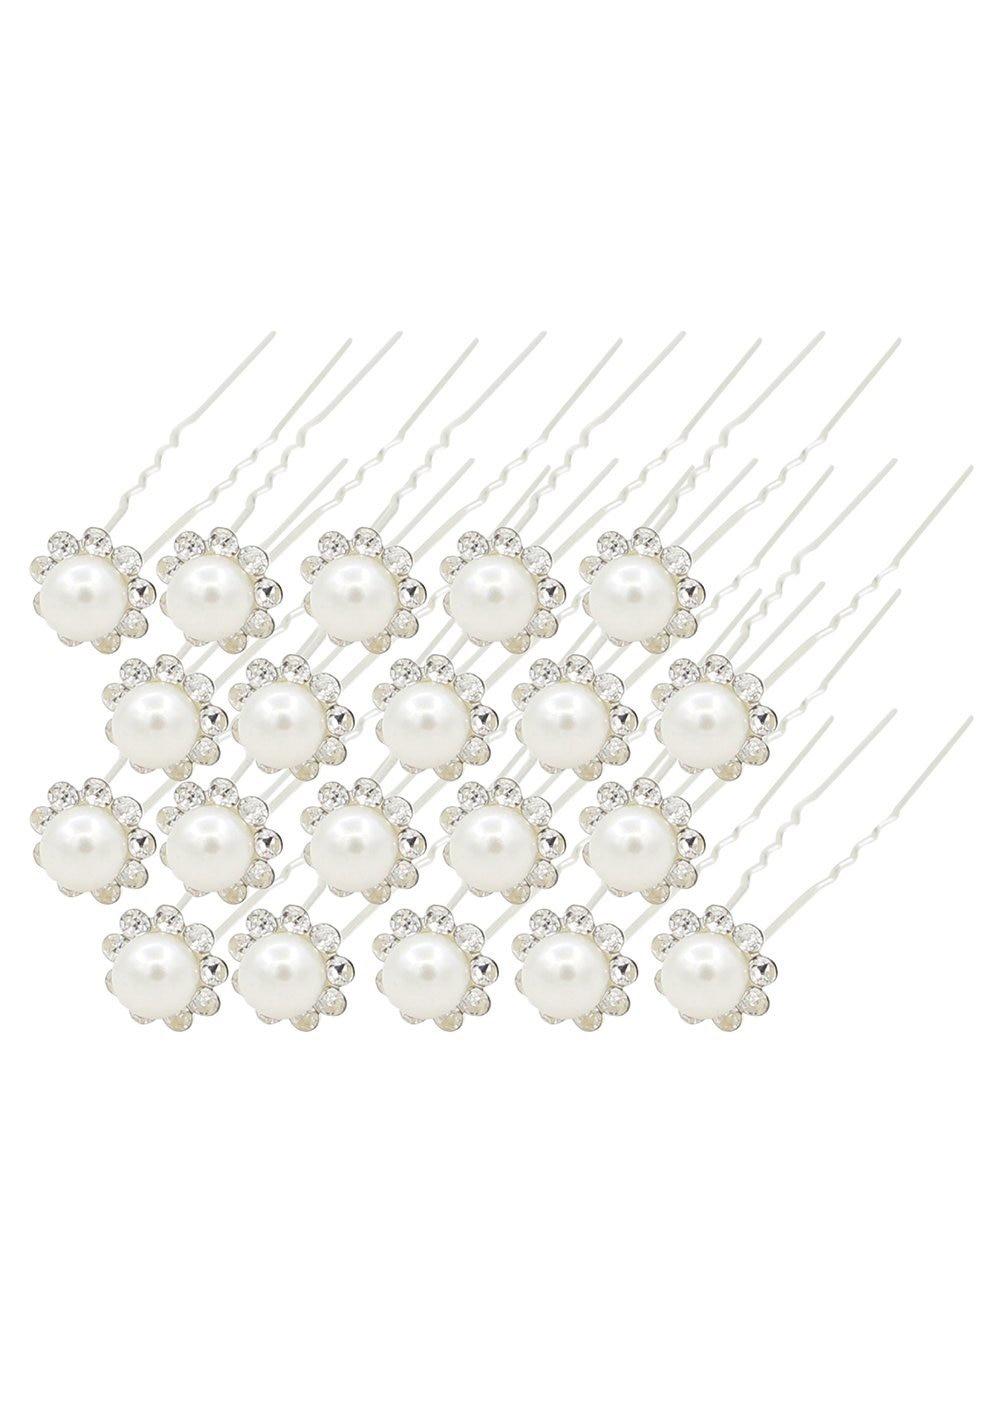 20 Pcs Wedding Bridal Pearl Flower Crystal Hairpin Hair Clips Bridesmaid (white)